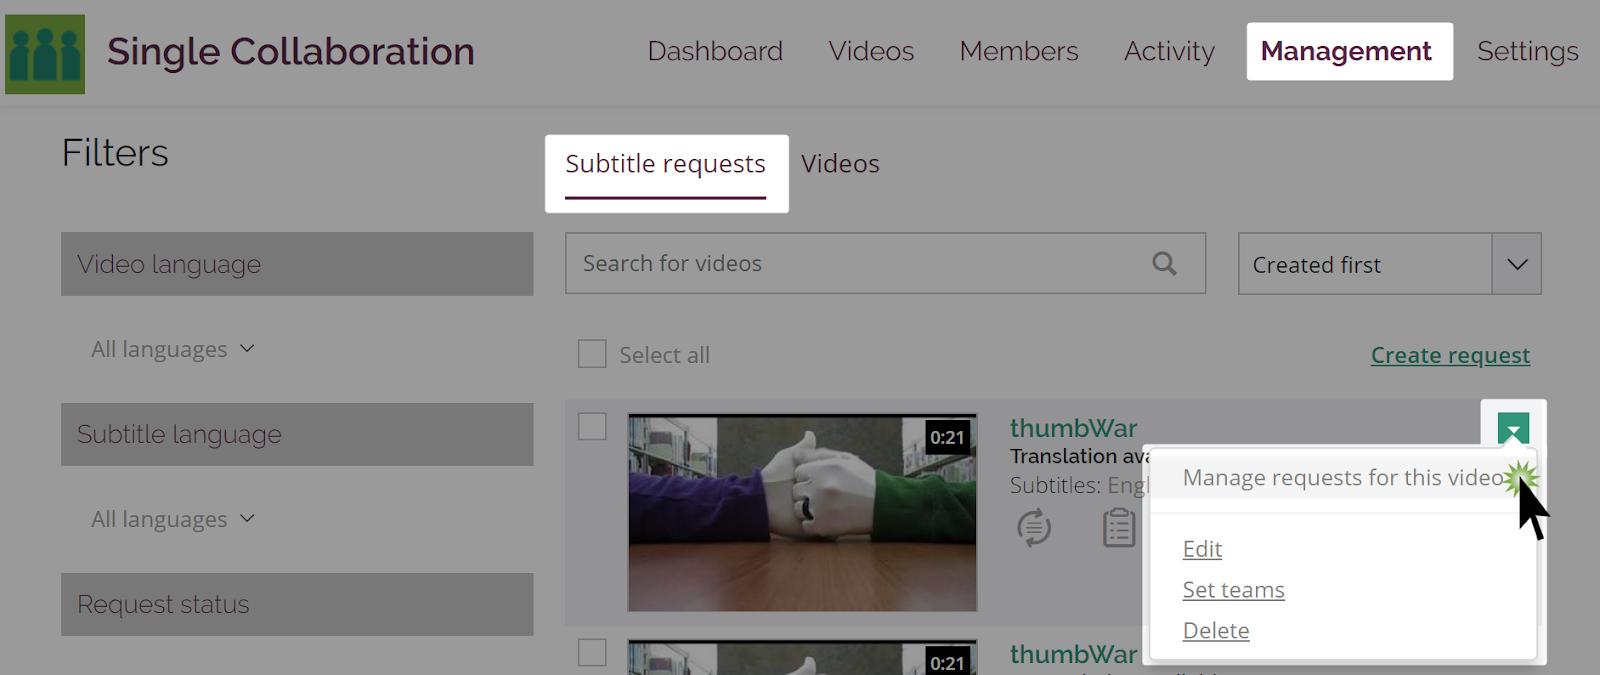 Manage subtitle requests option in video dropdown menu on subtitle requests management page